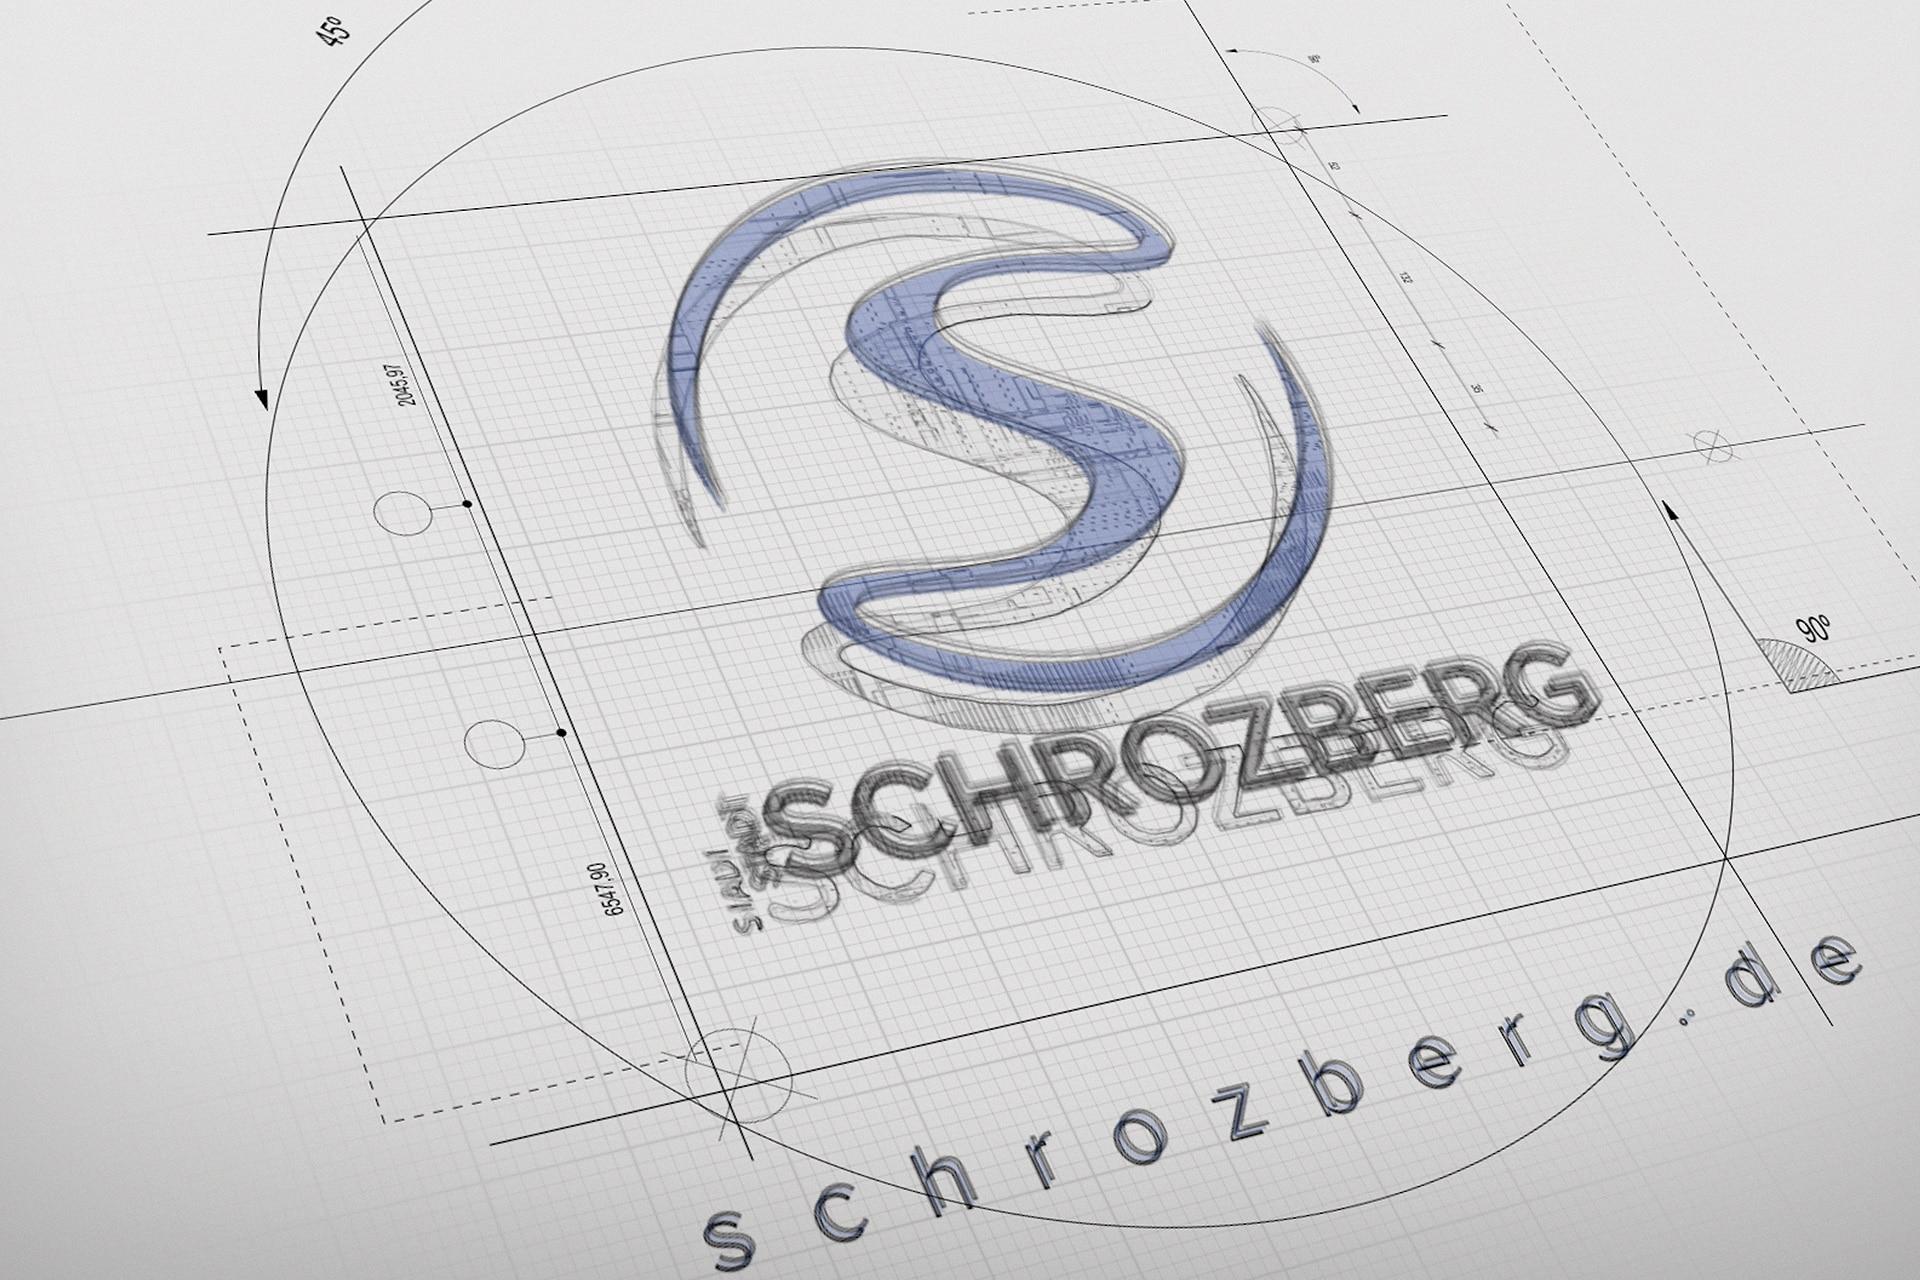 Logoentwurf Schrozberg